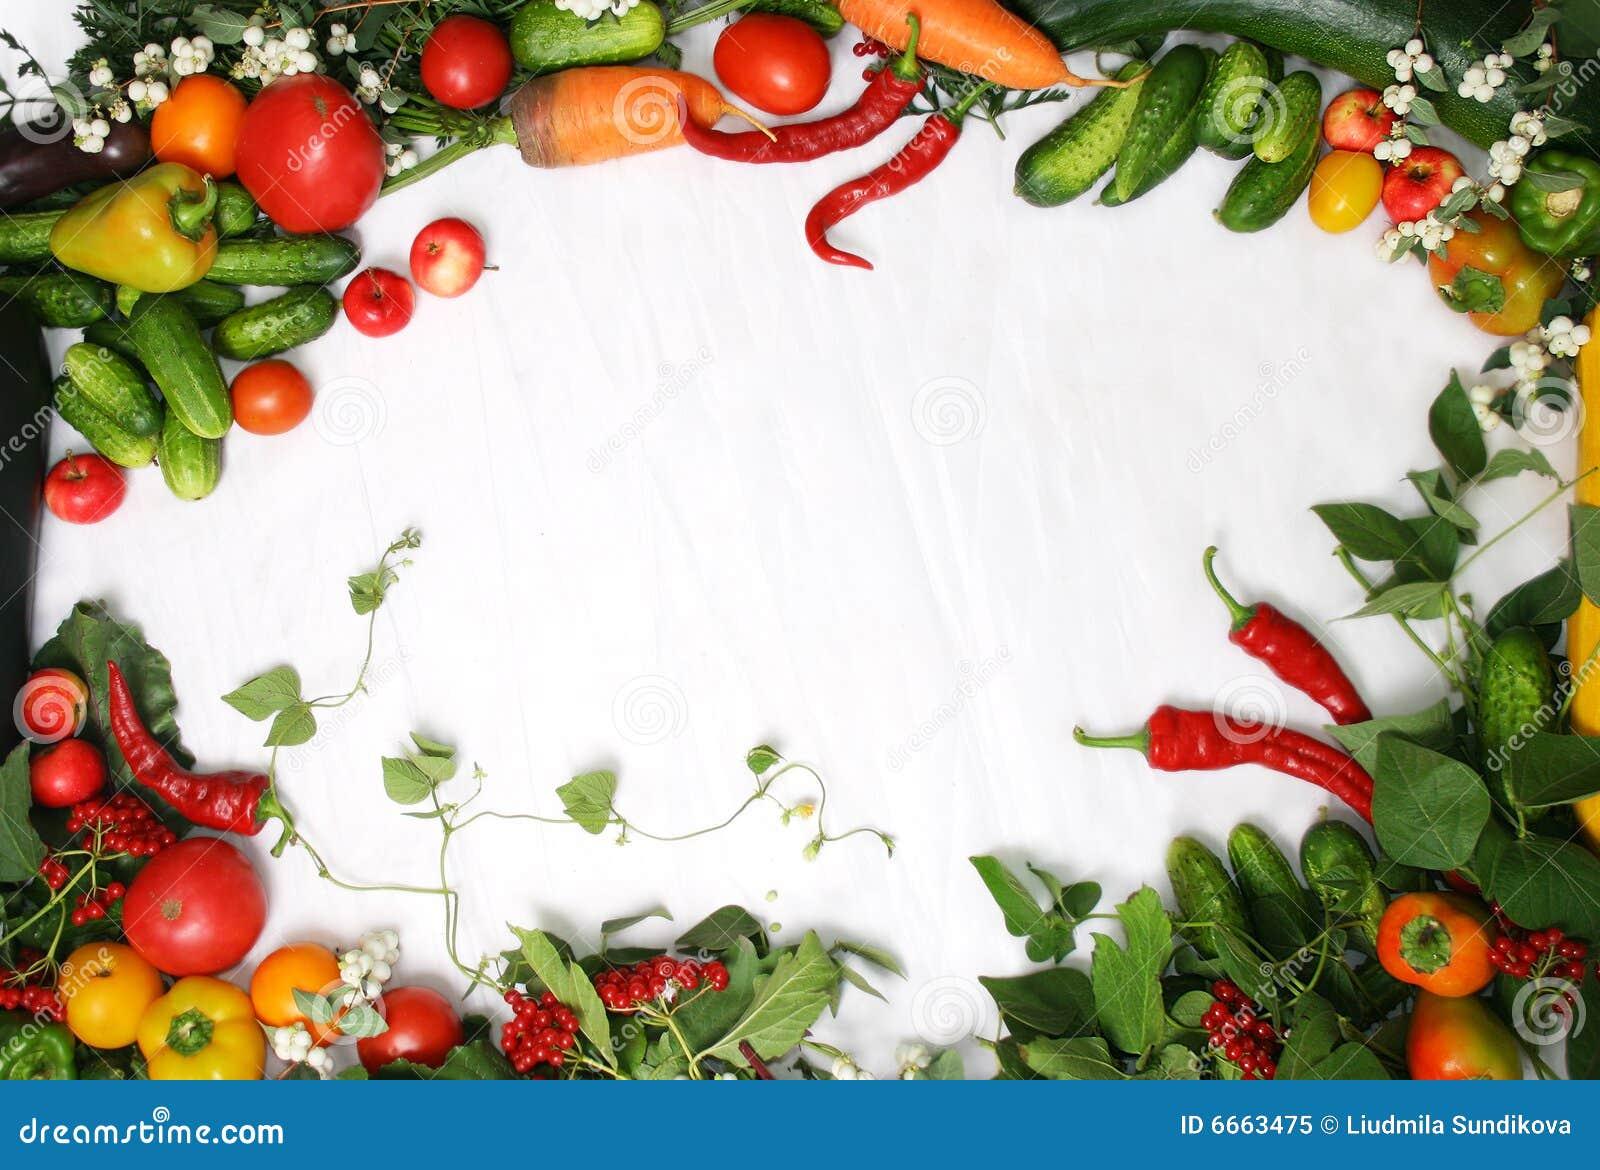 Vegetable garden border clipart vegetable garden border - Vegetable Garden Border Clipart Vegetable Garden Borde